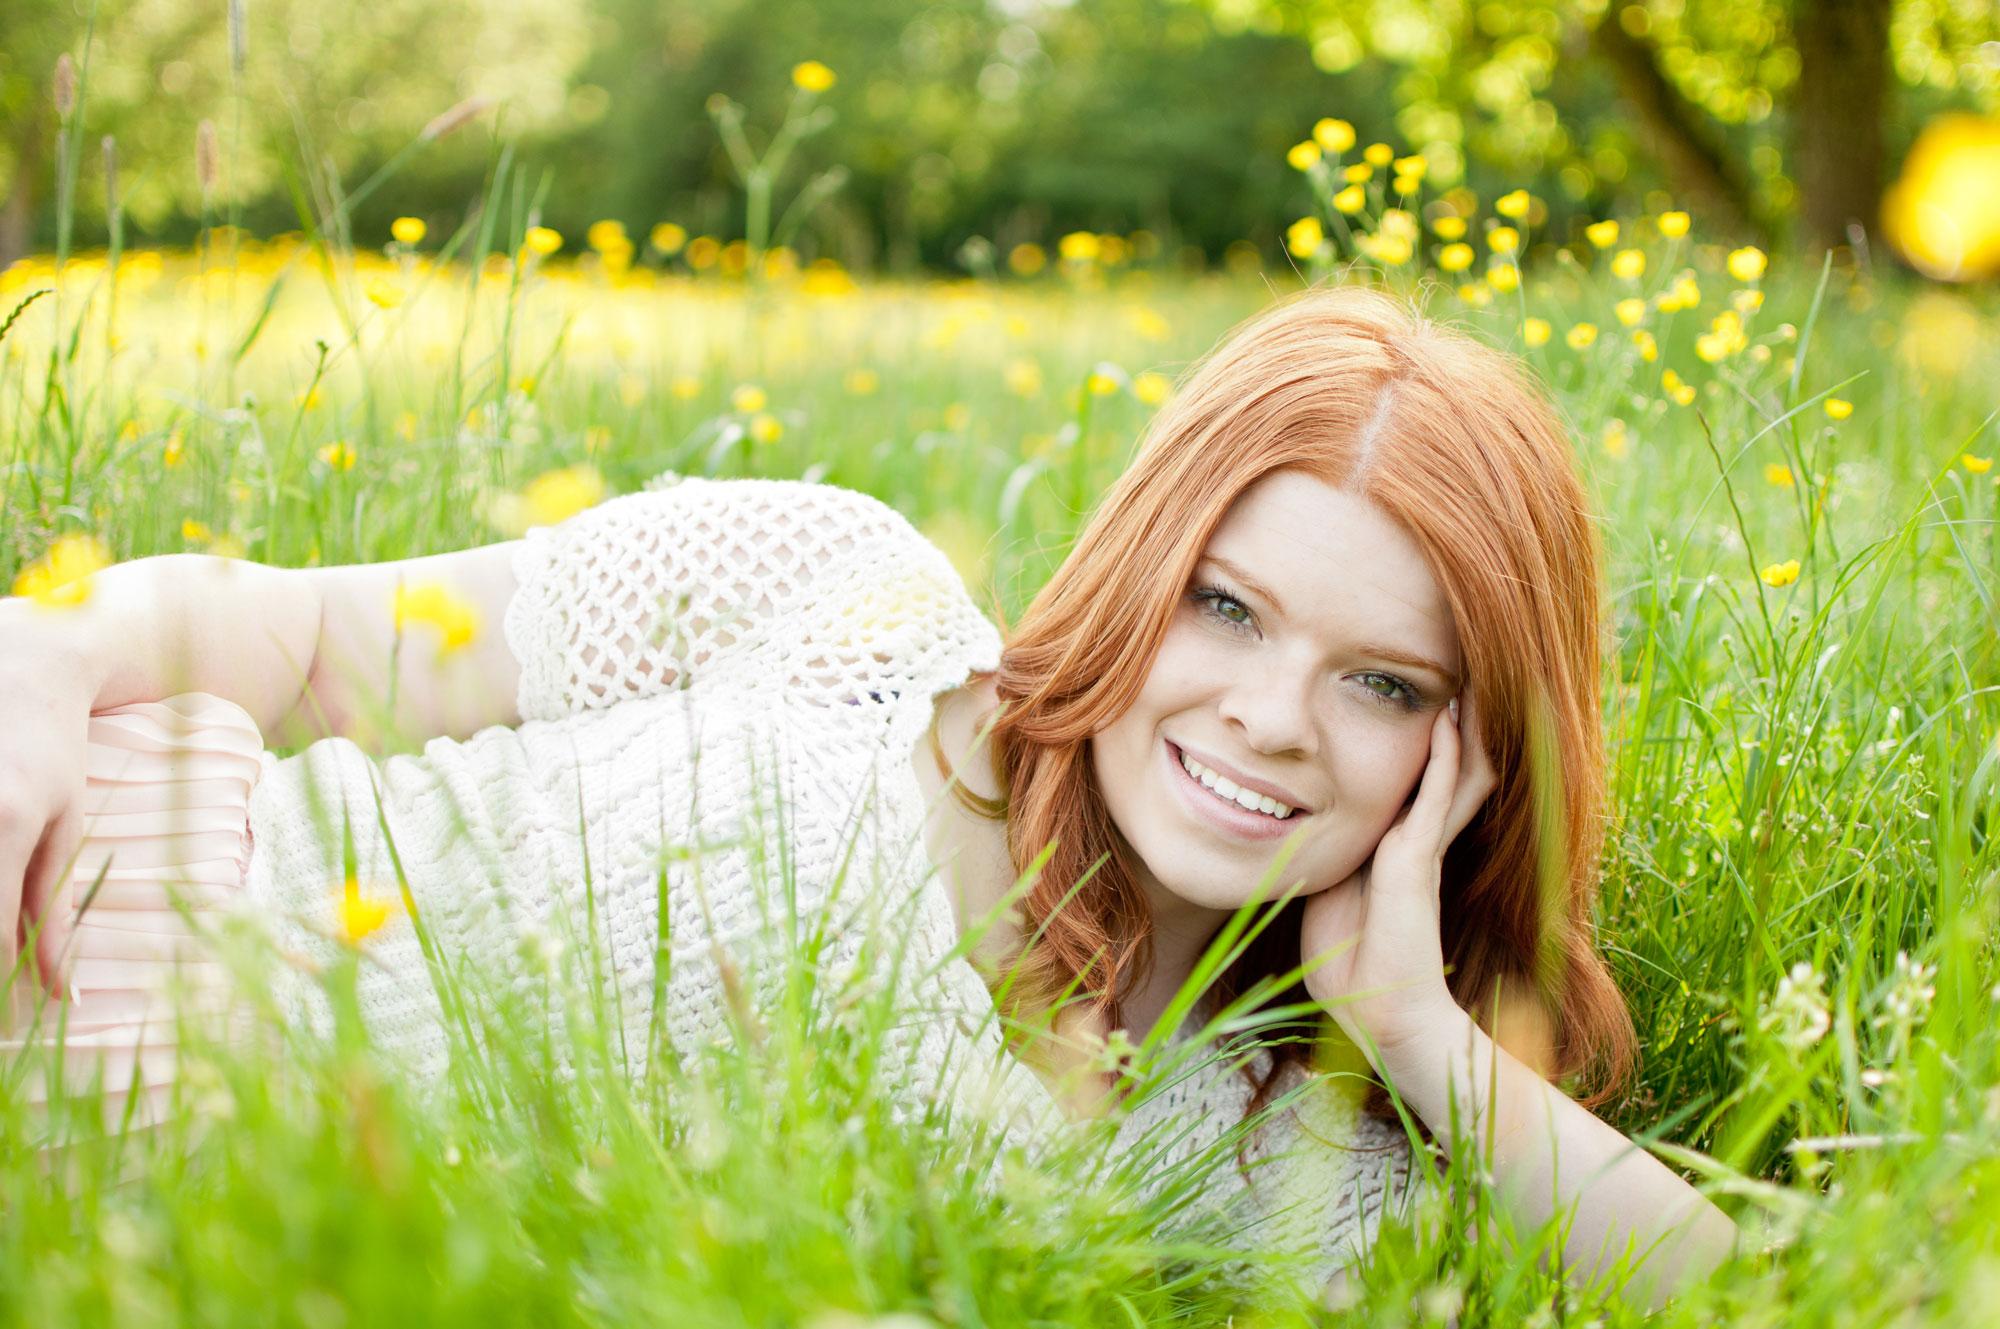 Senior girl in grass field